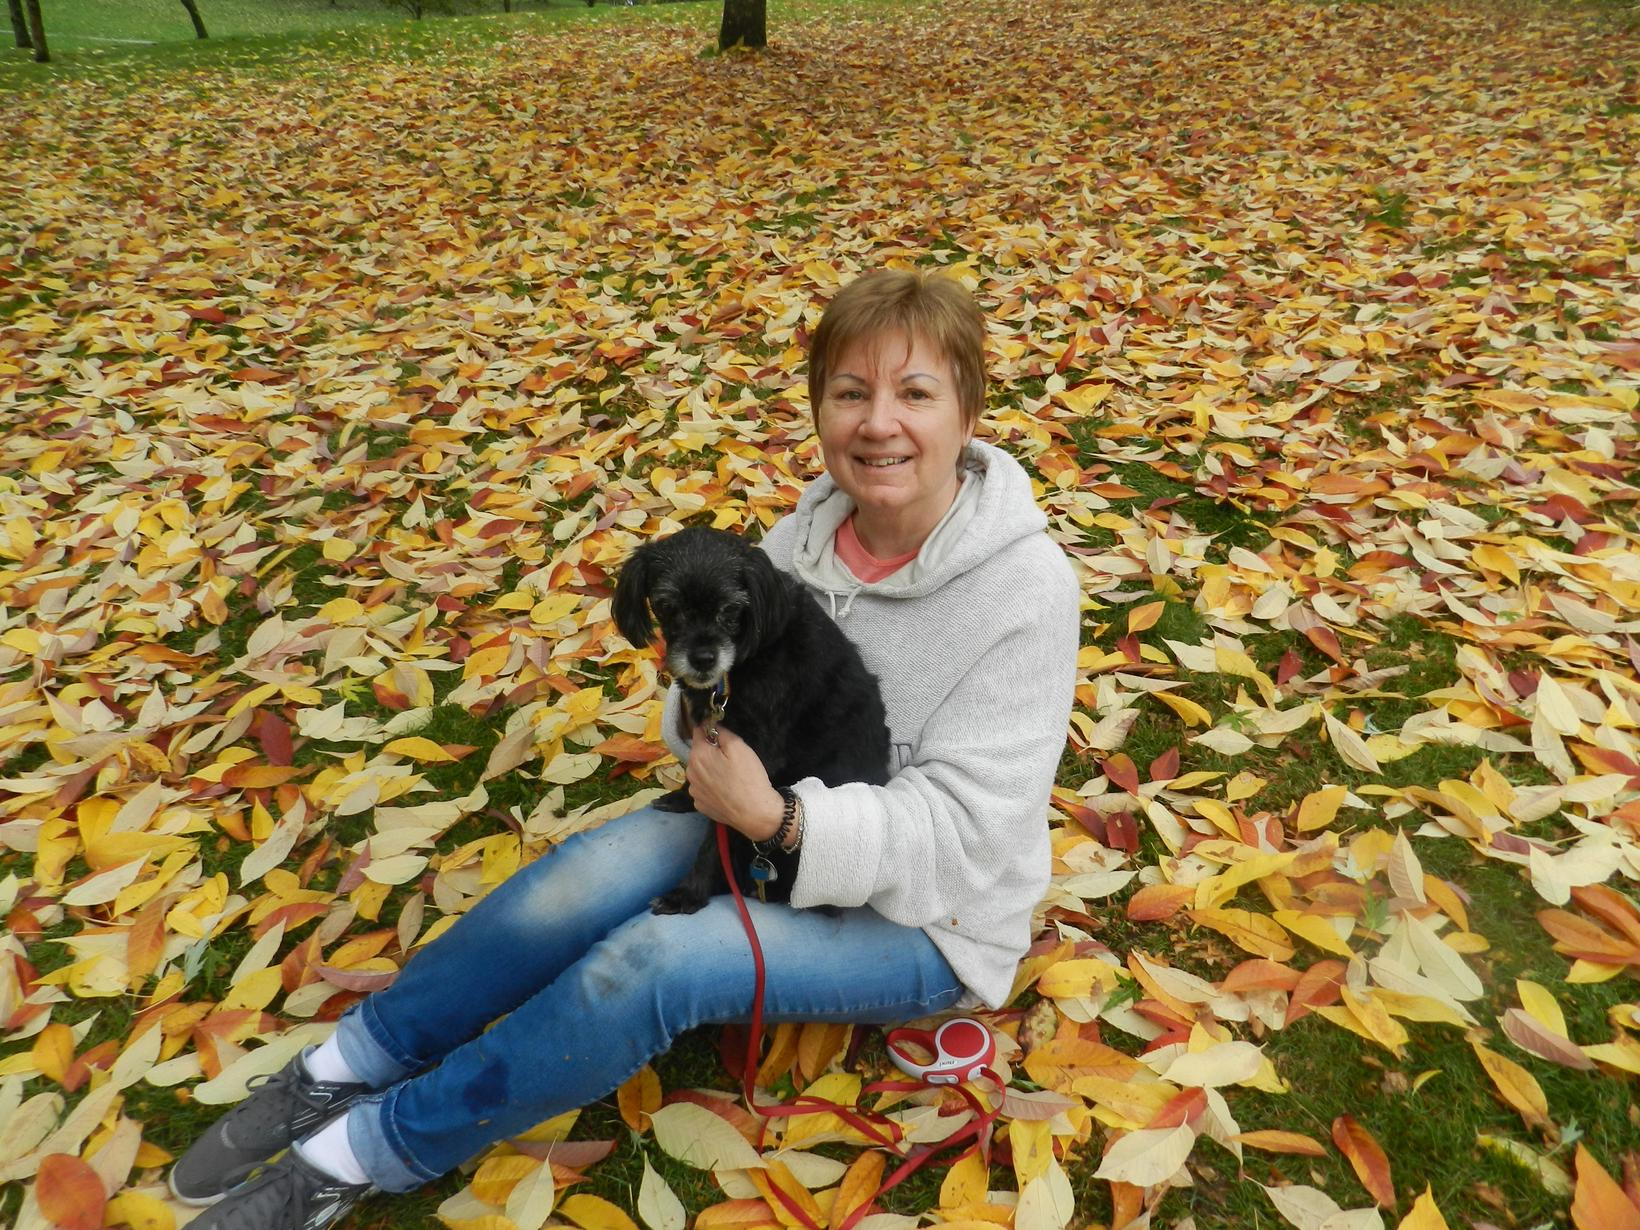 Phyllis from Coquitlam, British Columbia, Canada